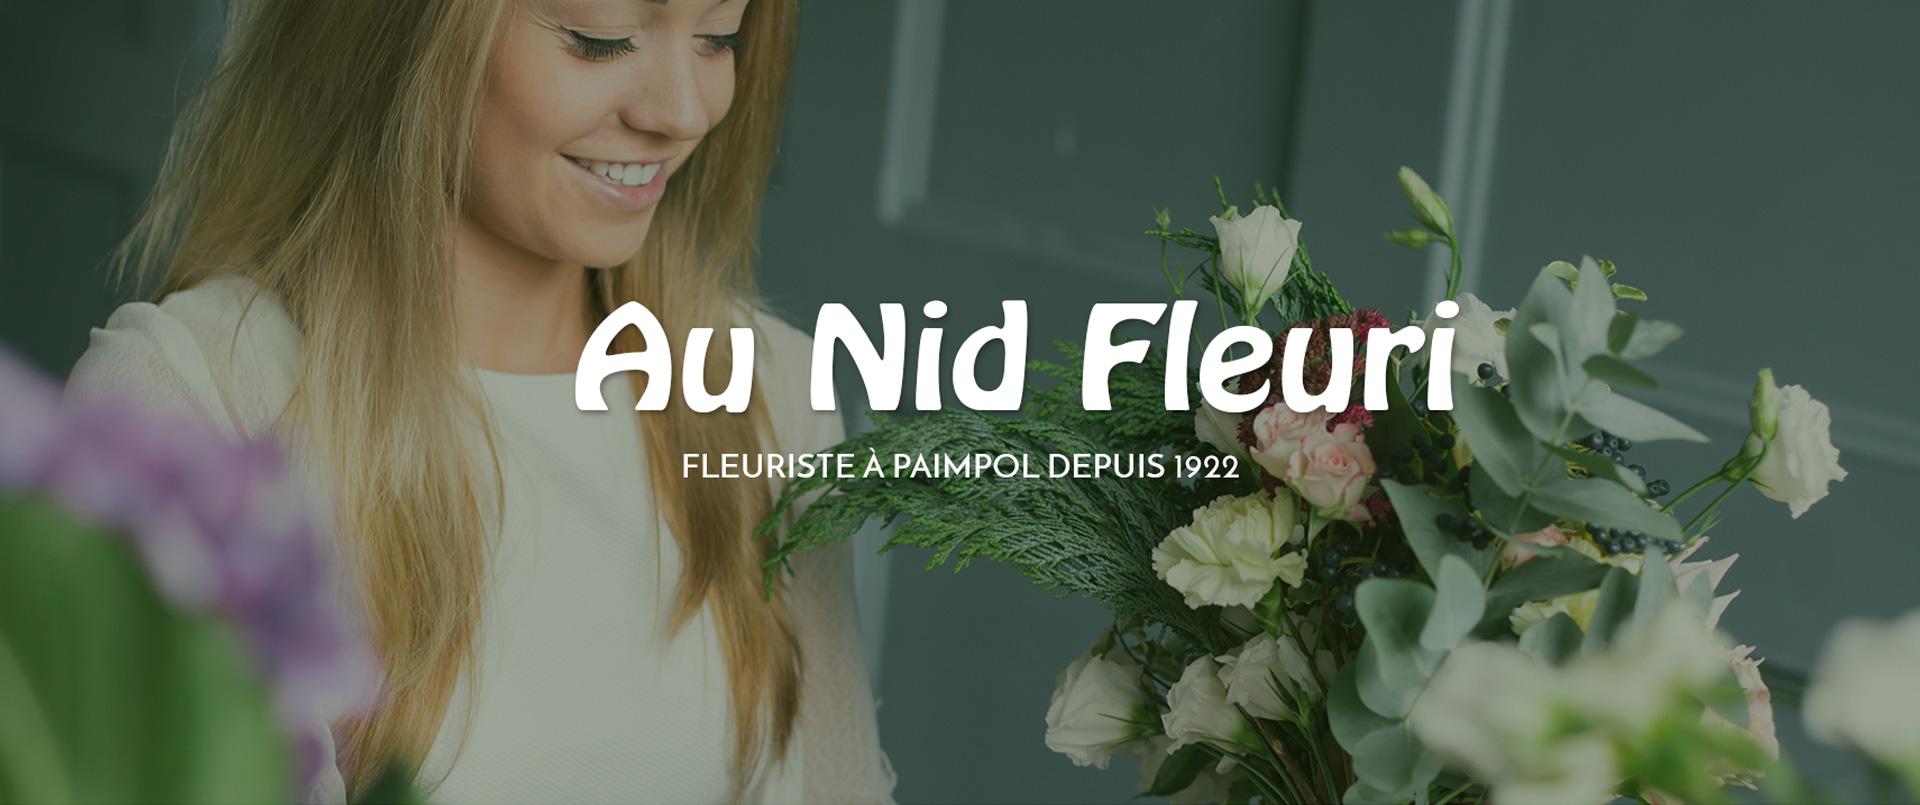 Au Nid Fleuri